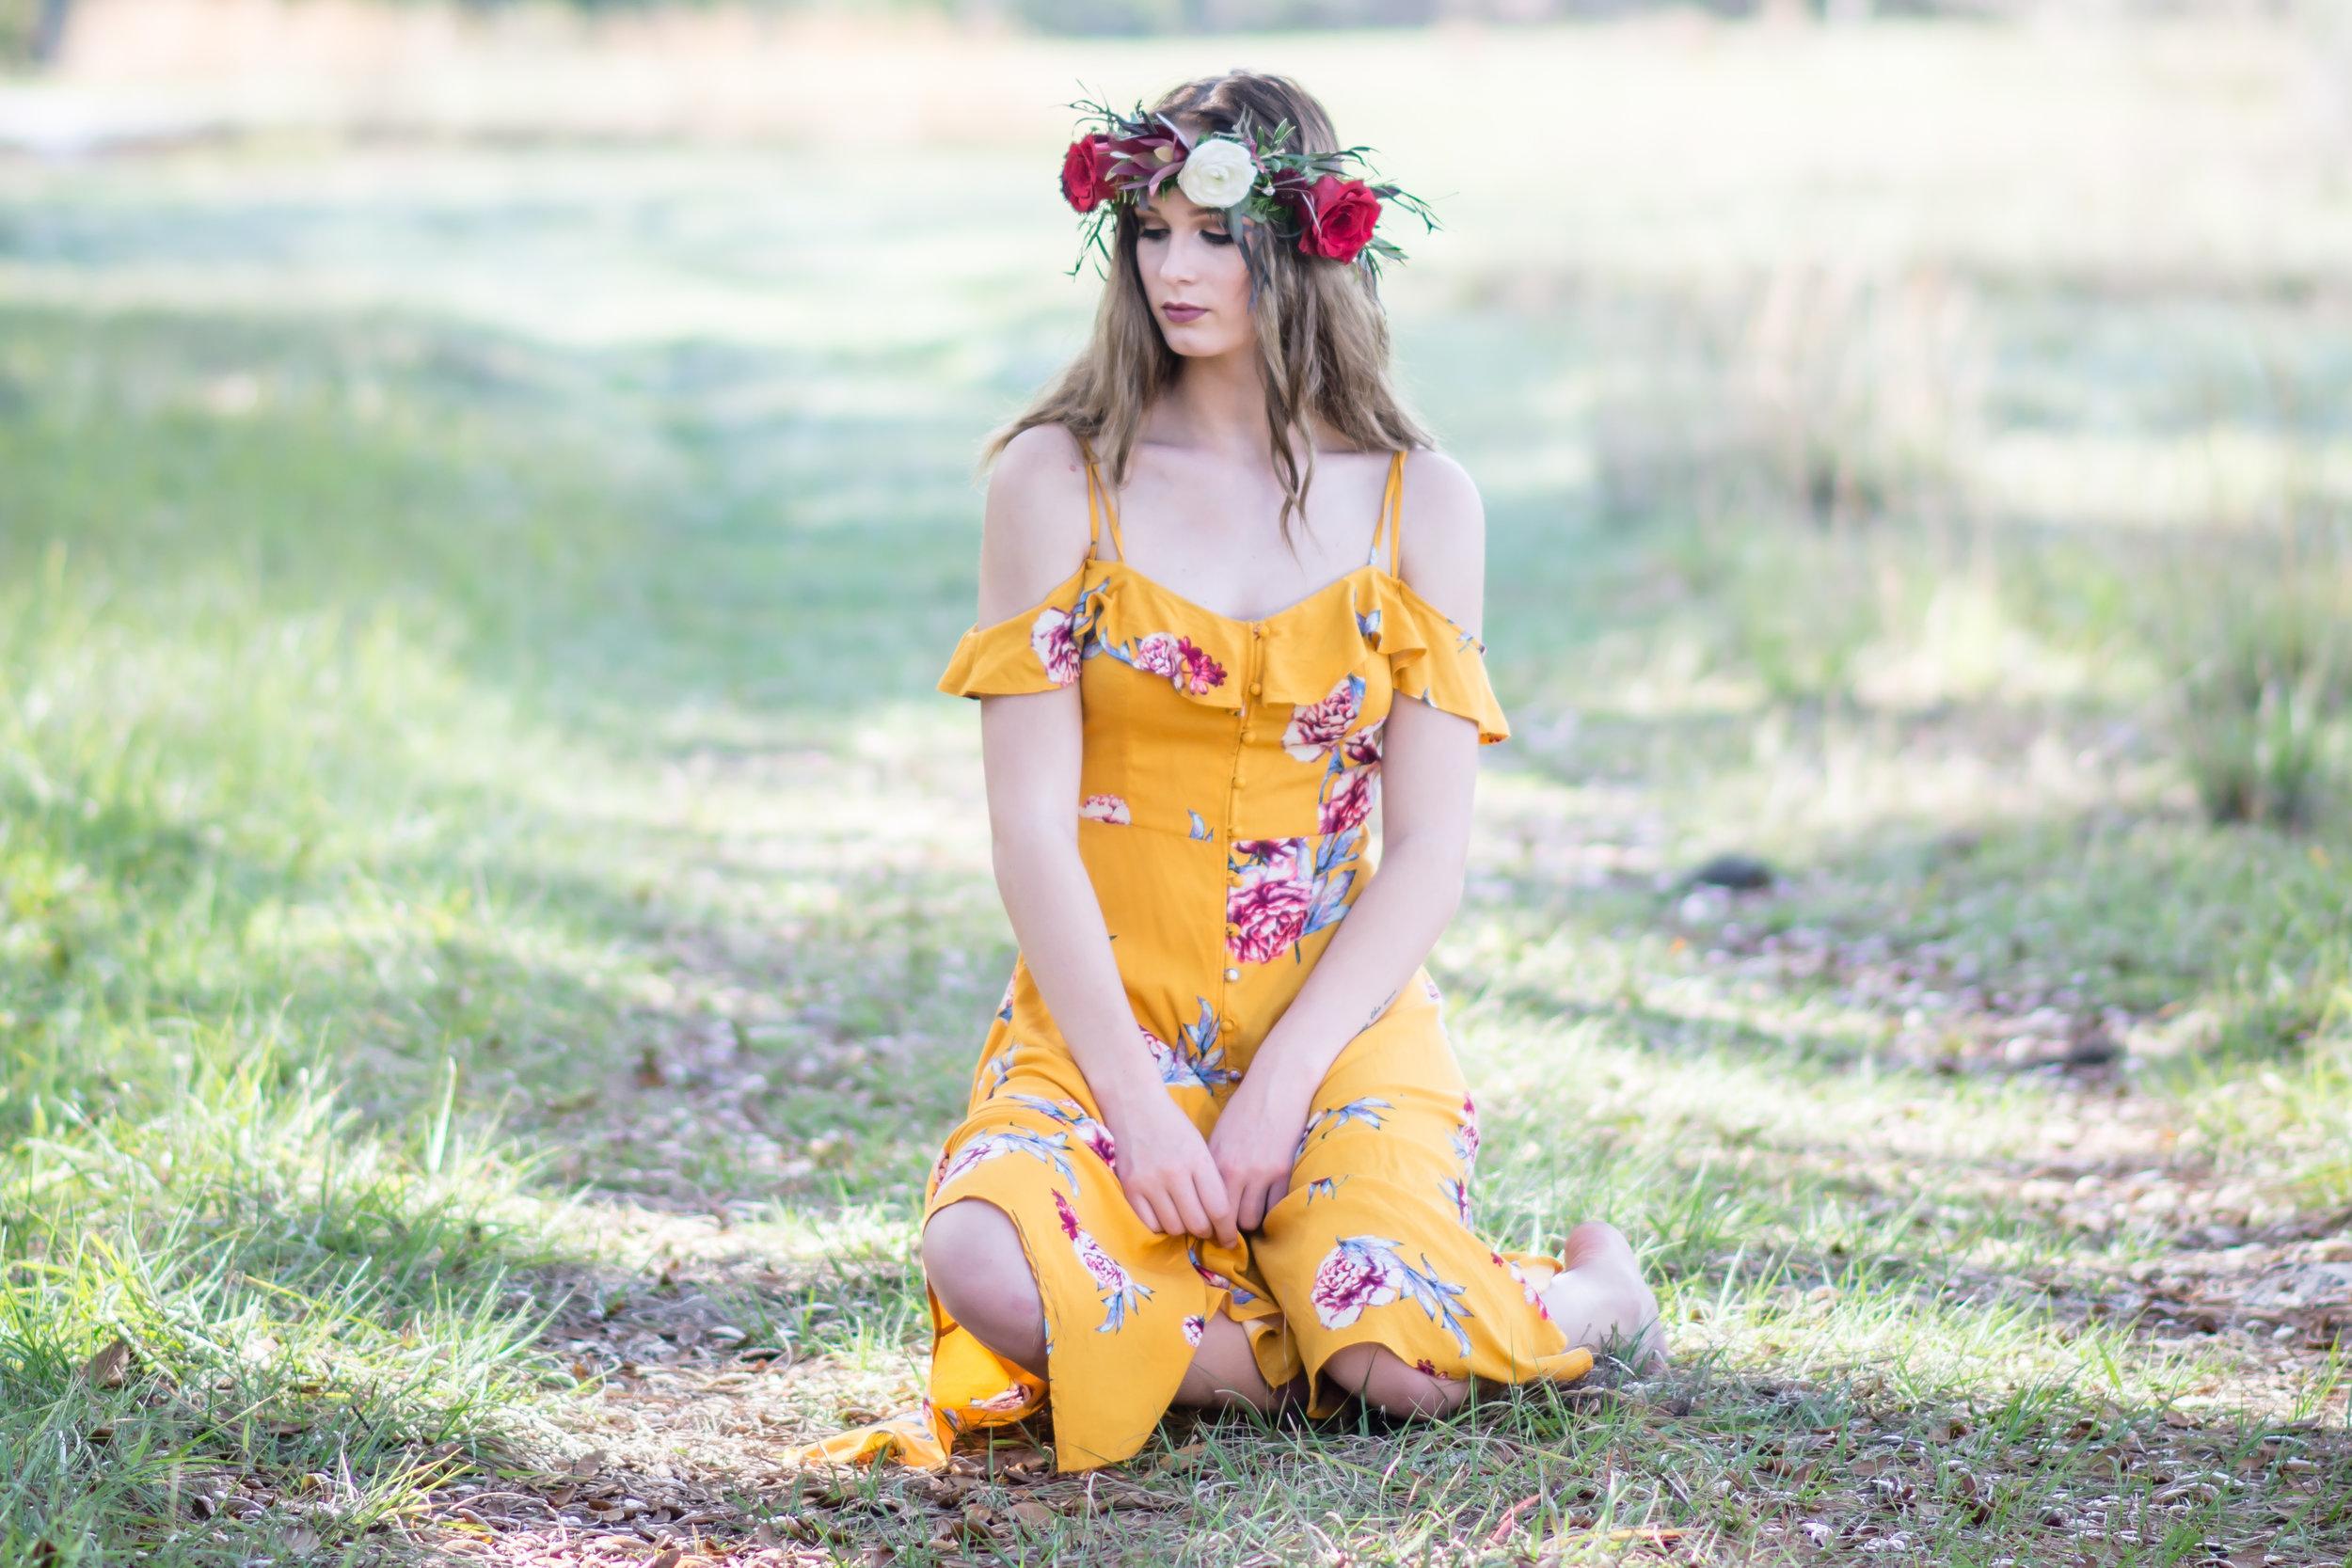 floral-headpiece-fashion-photoshoot-geneva-central-florida-photographer-yanitza-ninett-31.jpg